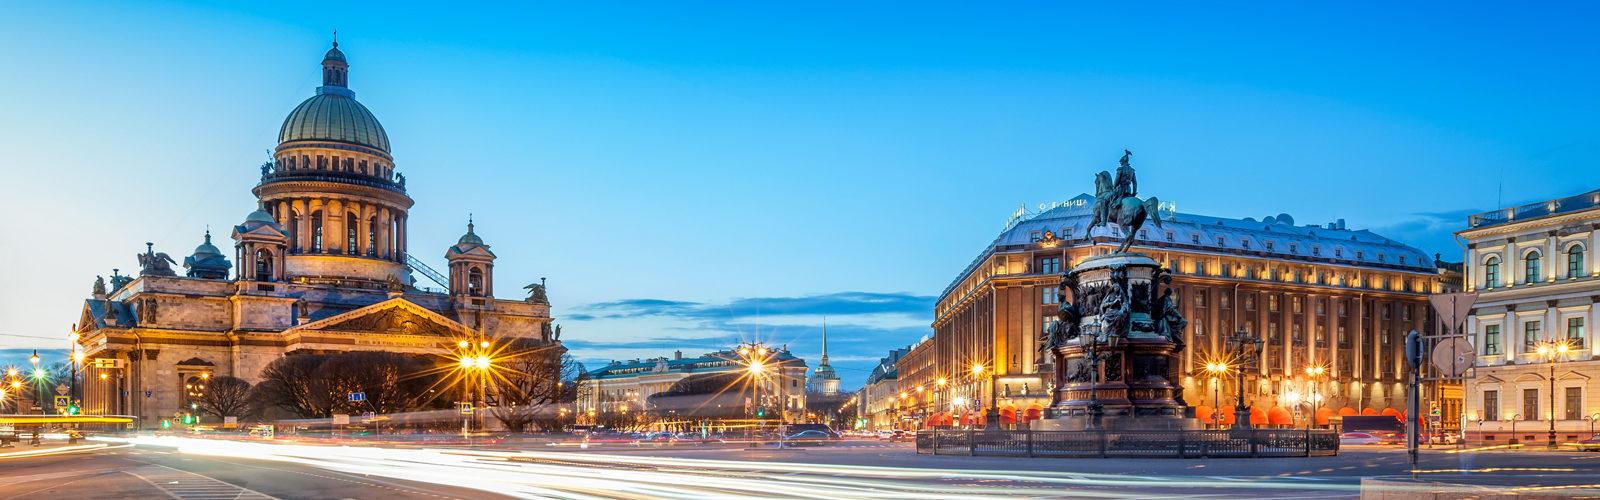 Санкт Петербург офис